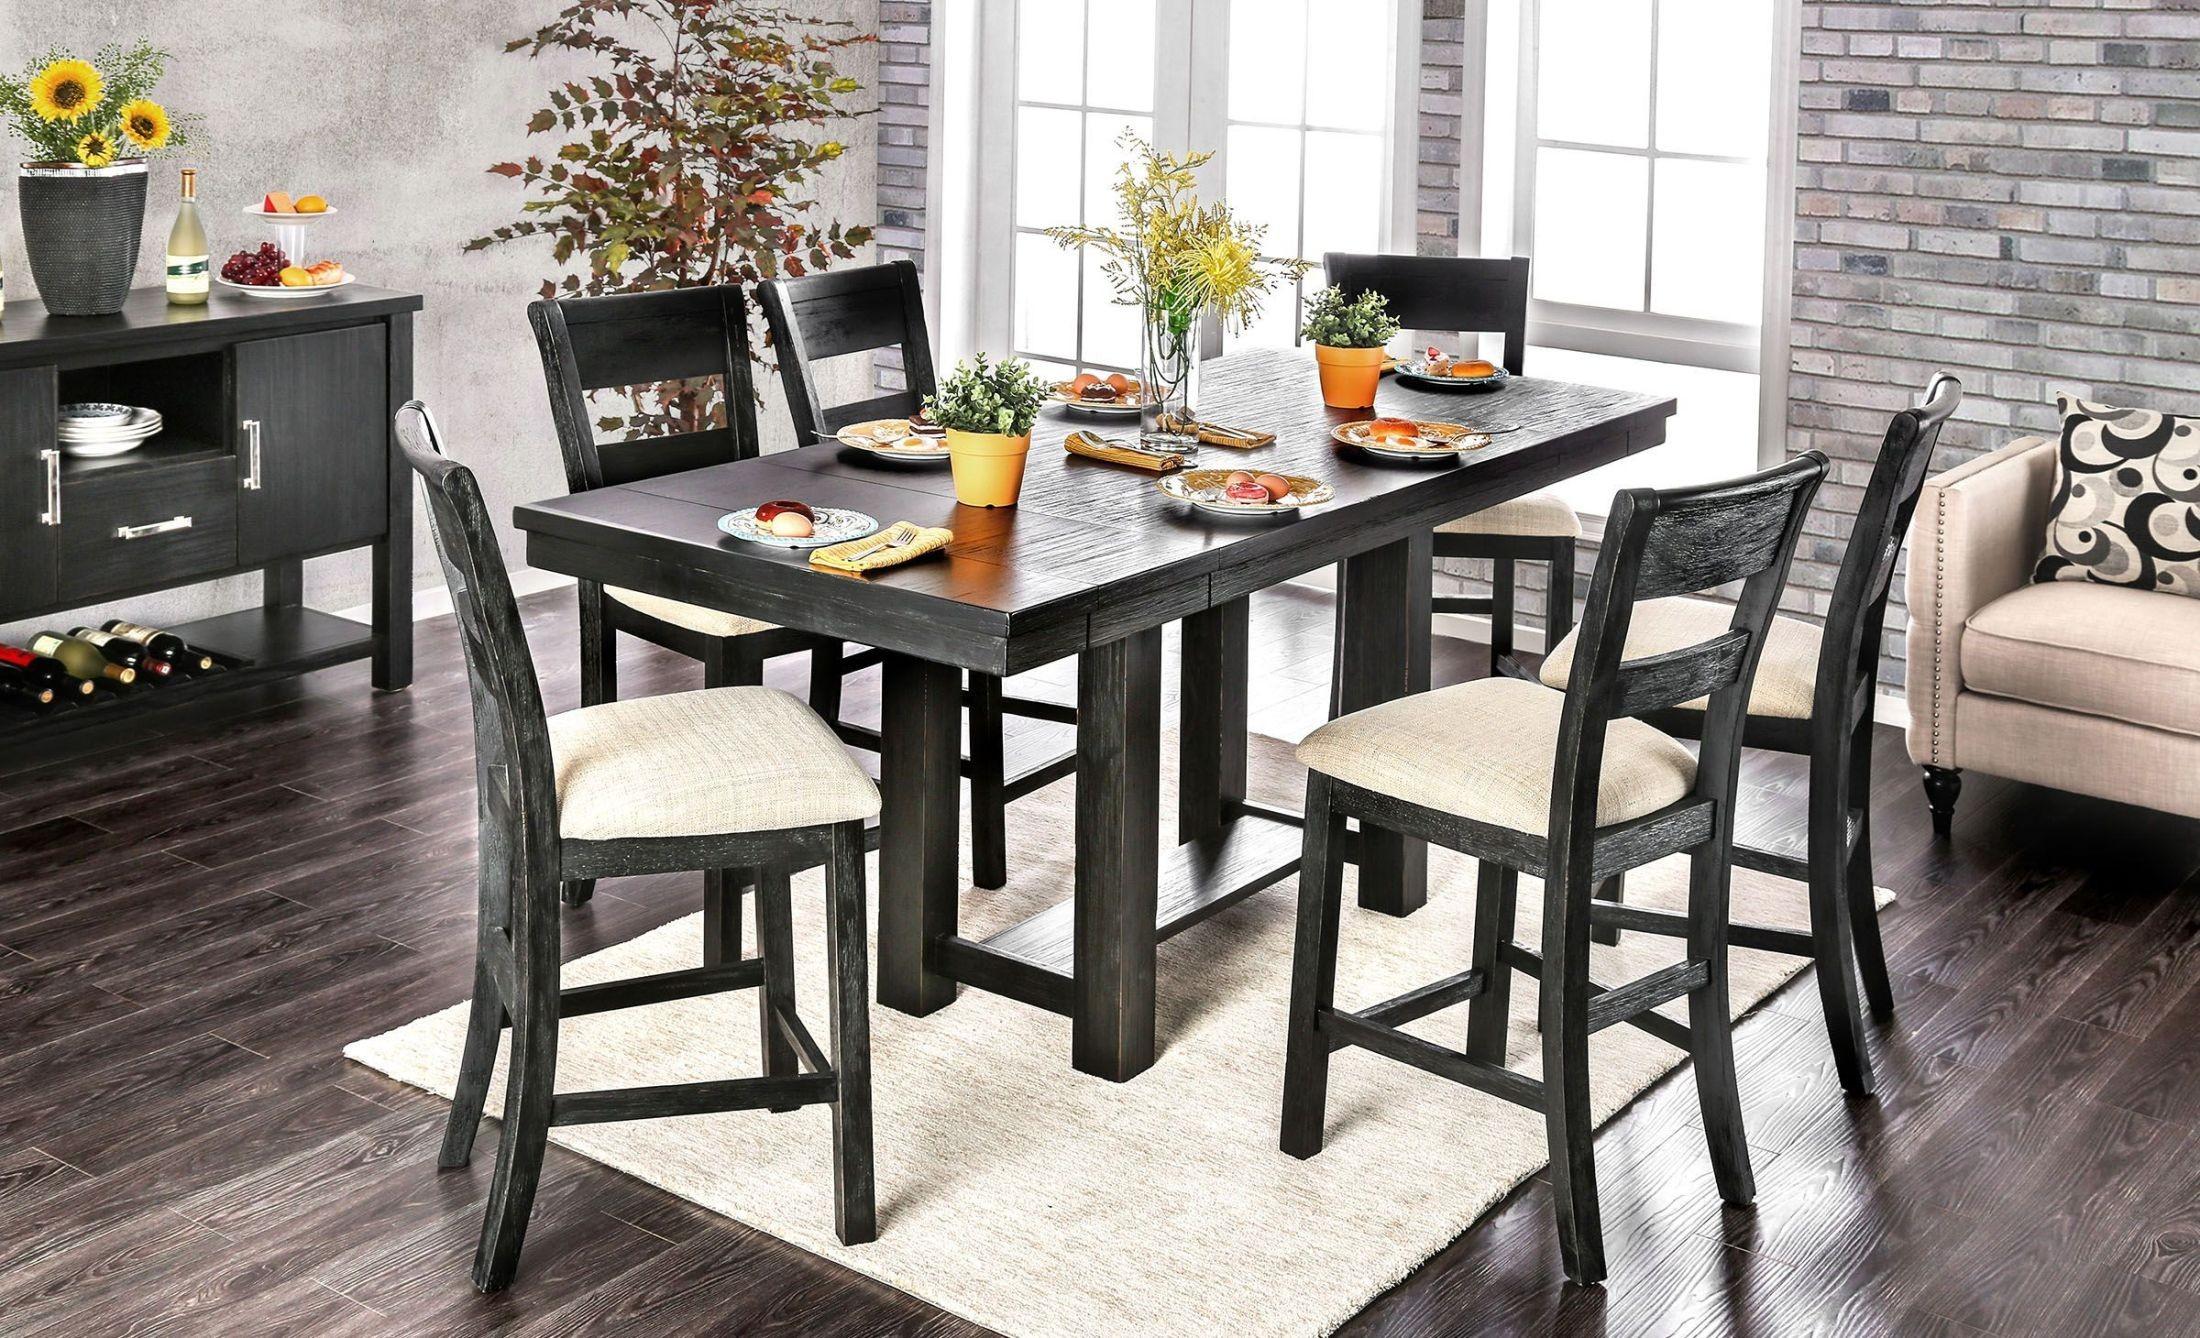 Thomaston Brushed Black Counter Height Dining Room Set